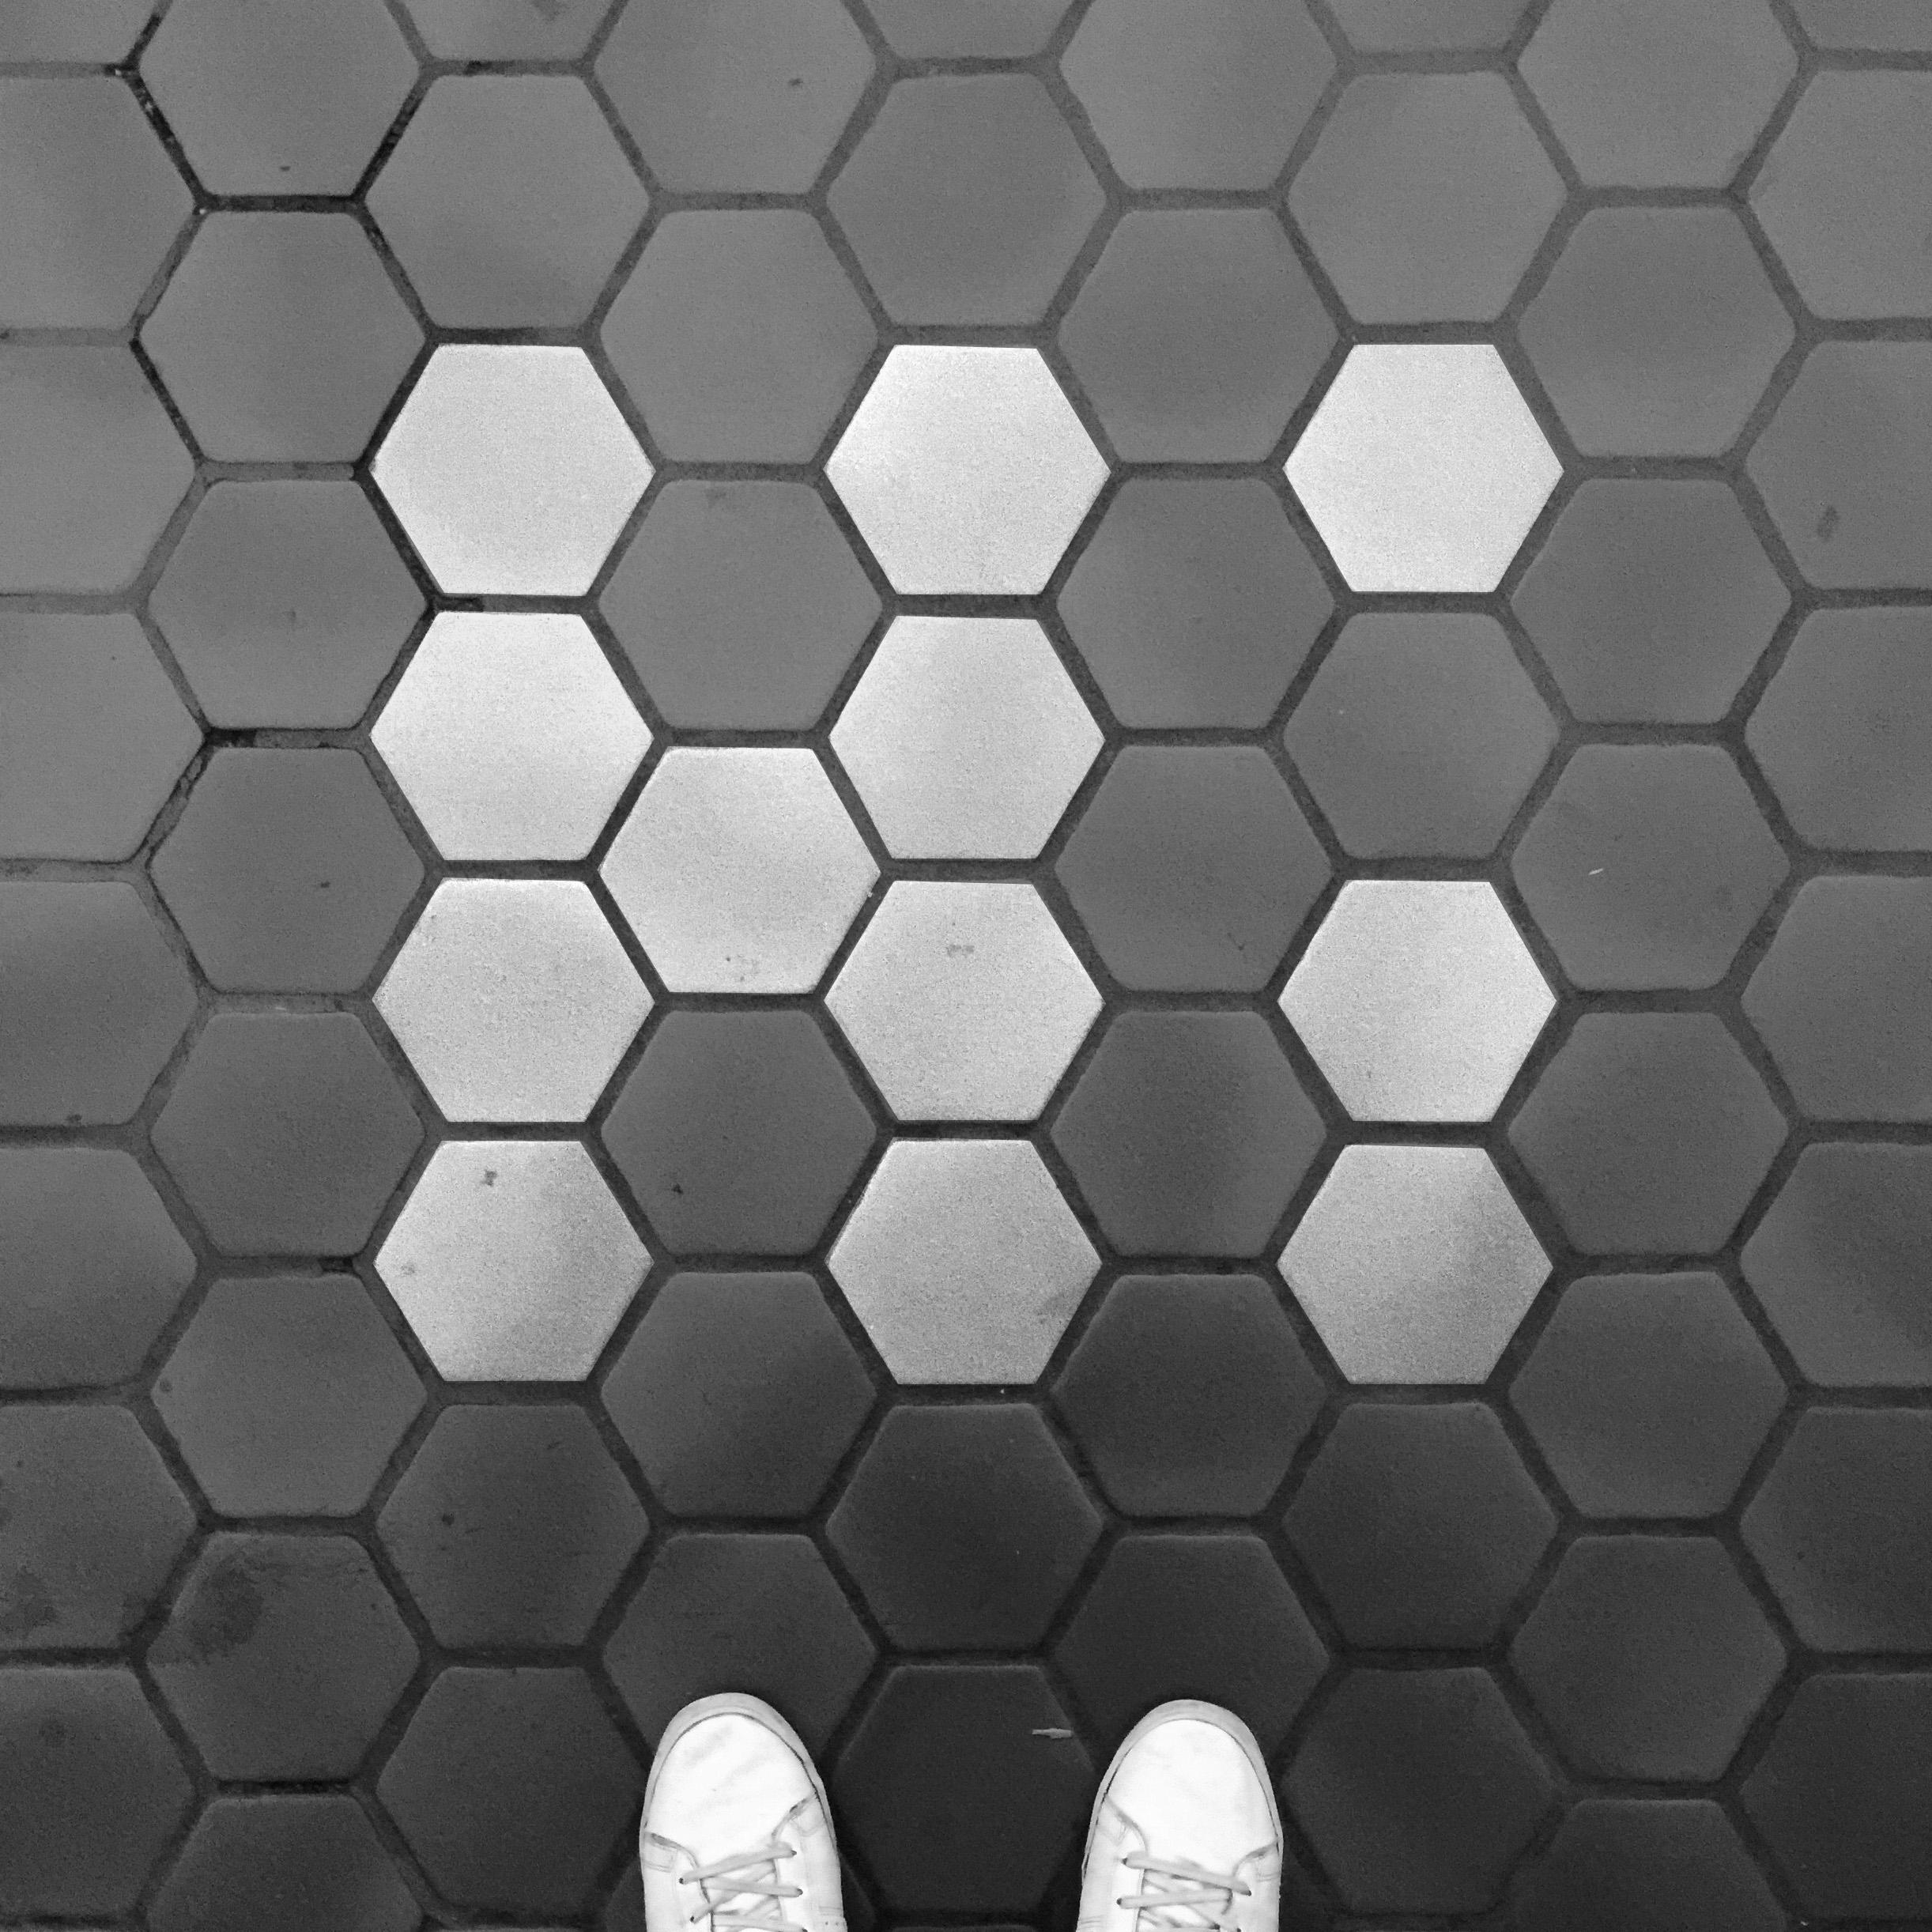 4 square Hi-Metro-Tiles-4-3-17.jpg